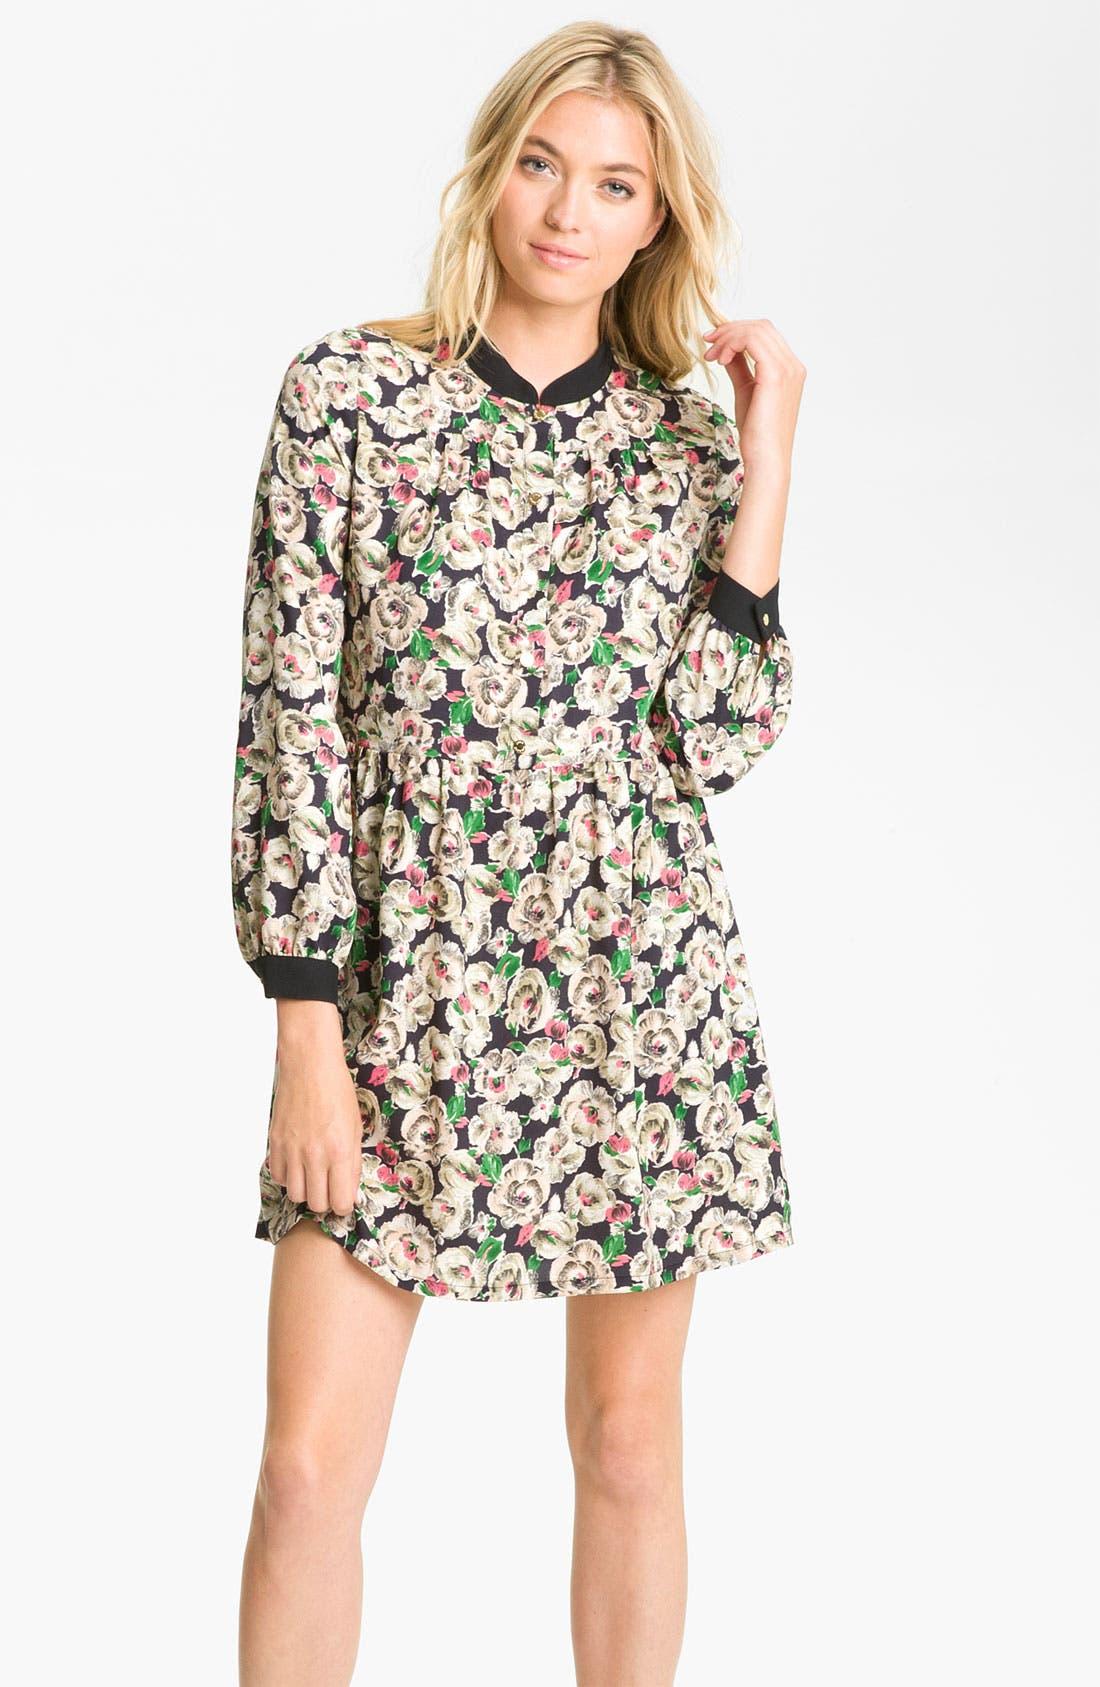 Main Image - Juicy Couture Floral Print Dress